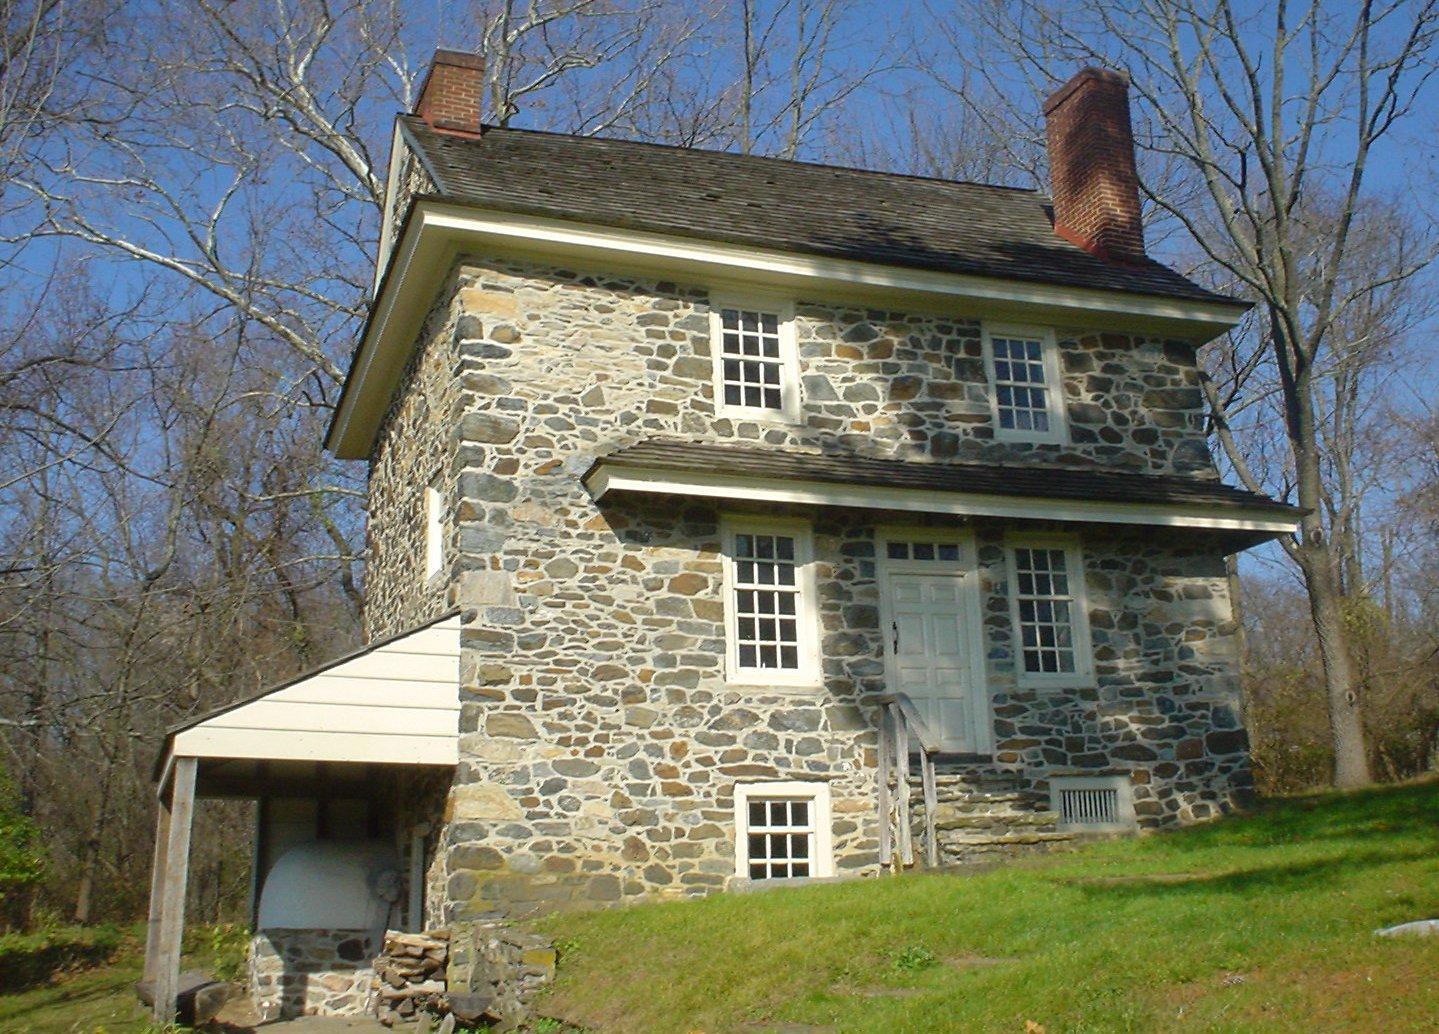 JChadds House - Photo Credit: Smallbones on English Wikipedia. [Public domain], from Wikimedia Commons